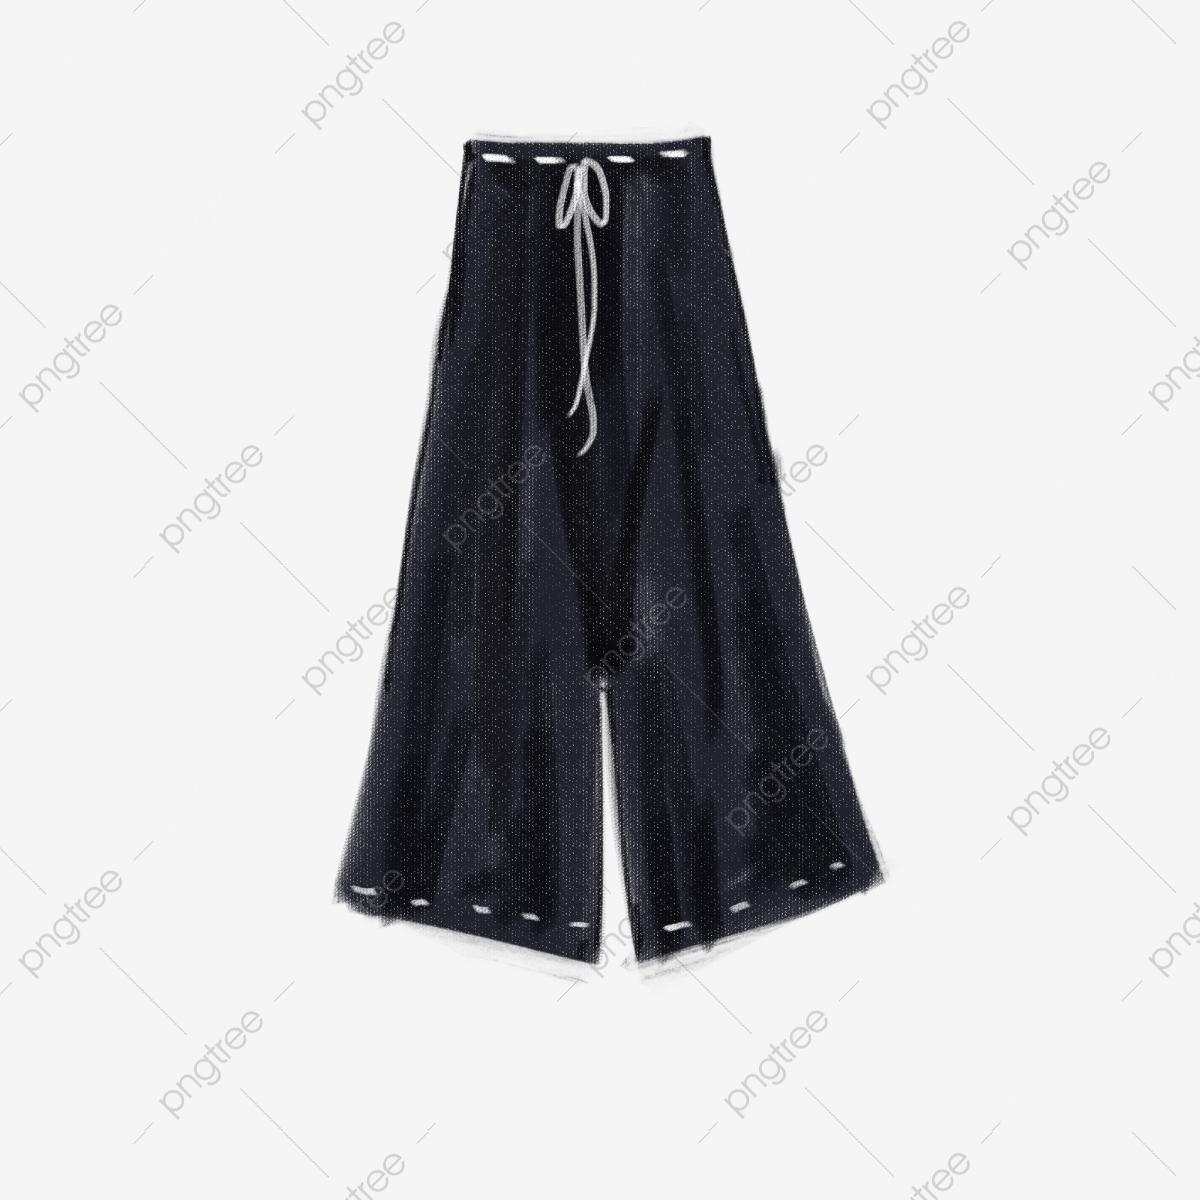 Pants clipart black thing. Alexander mcqueen suit png